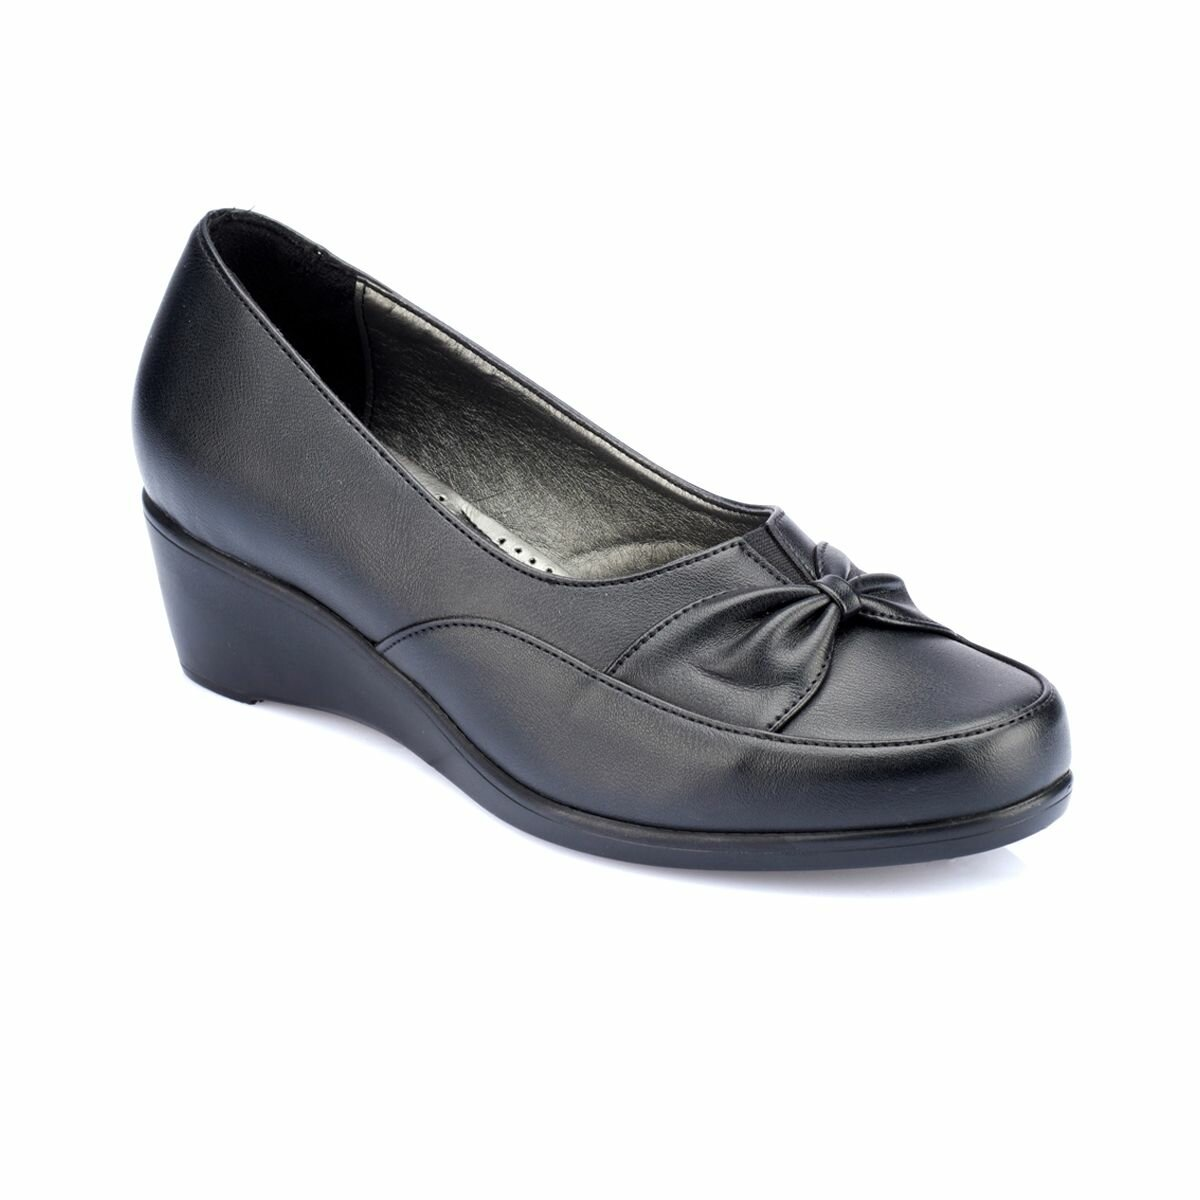 FLO 82.150011.Z Black Women Shoes Polaris